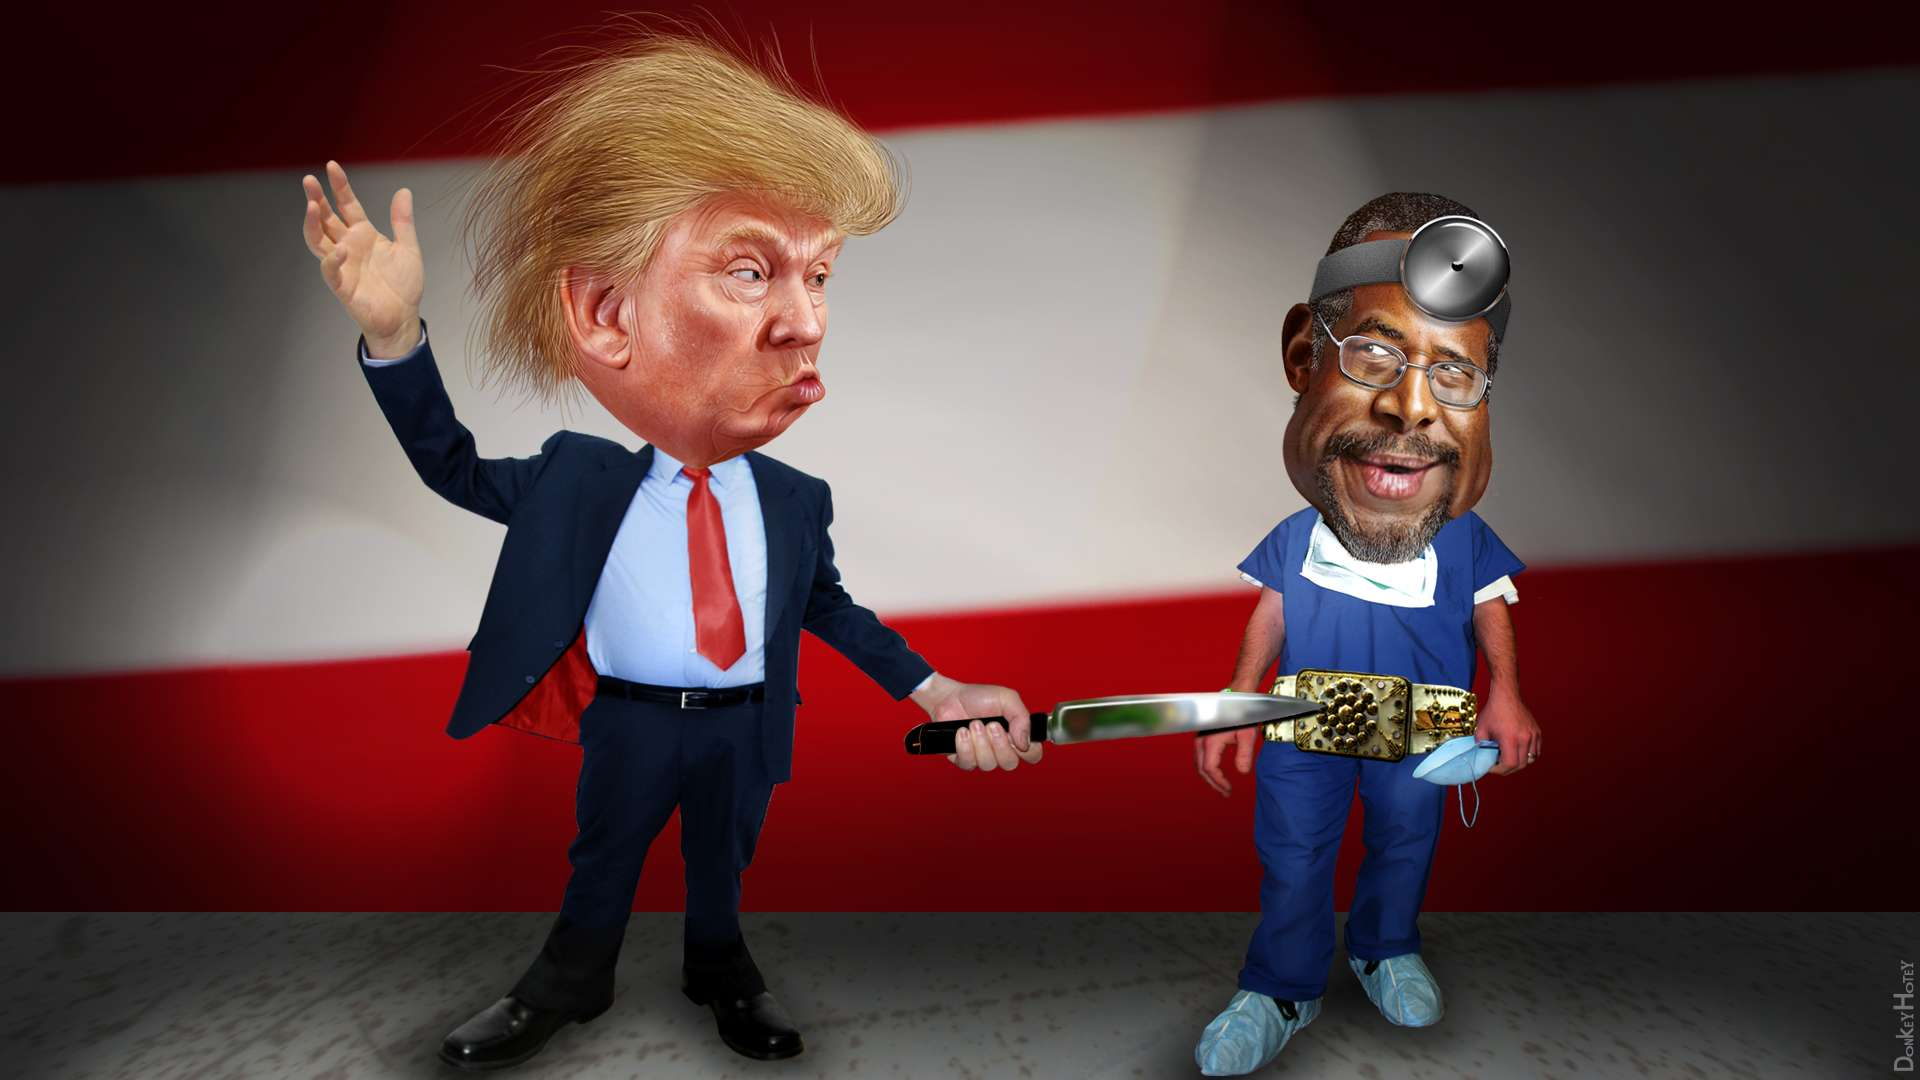 Donald Trump Stabbing Ben Carson in the Belt Buckle